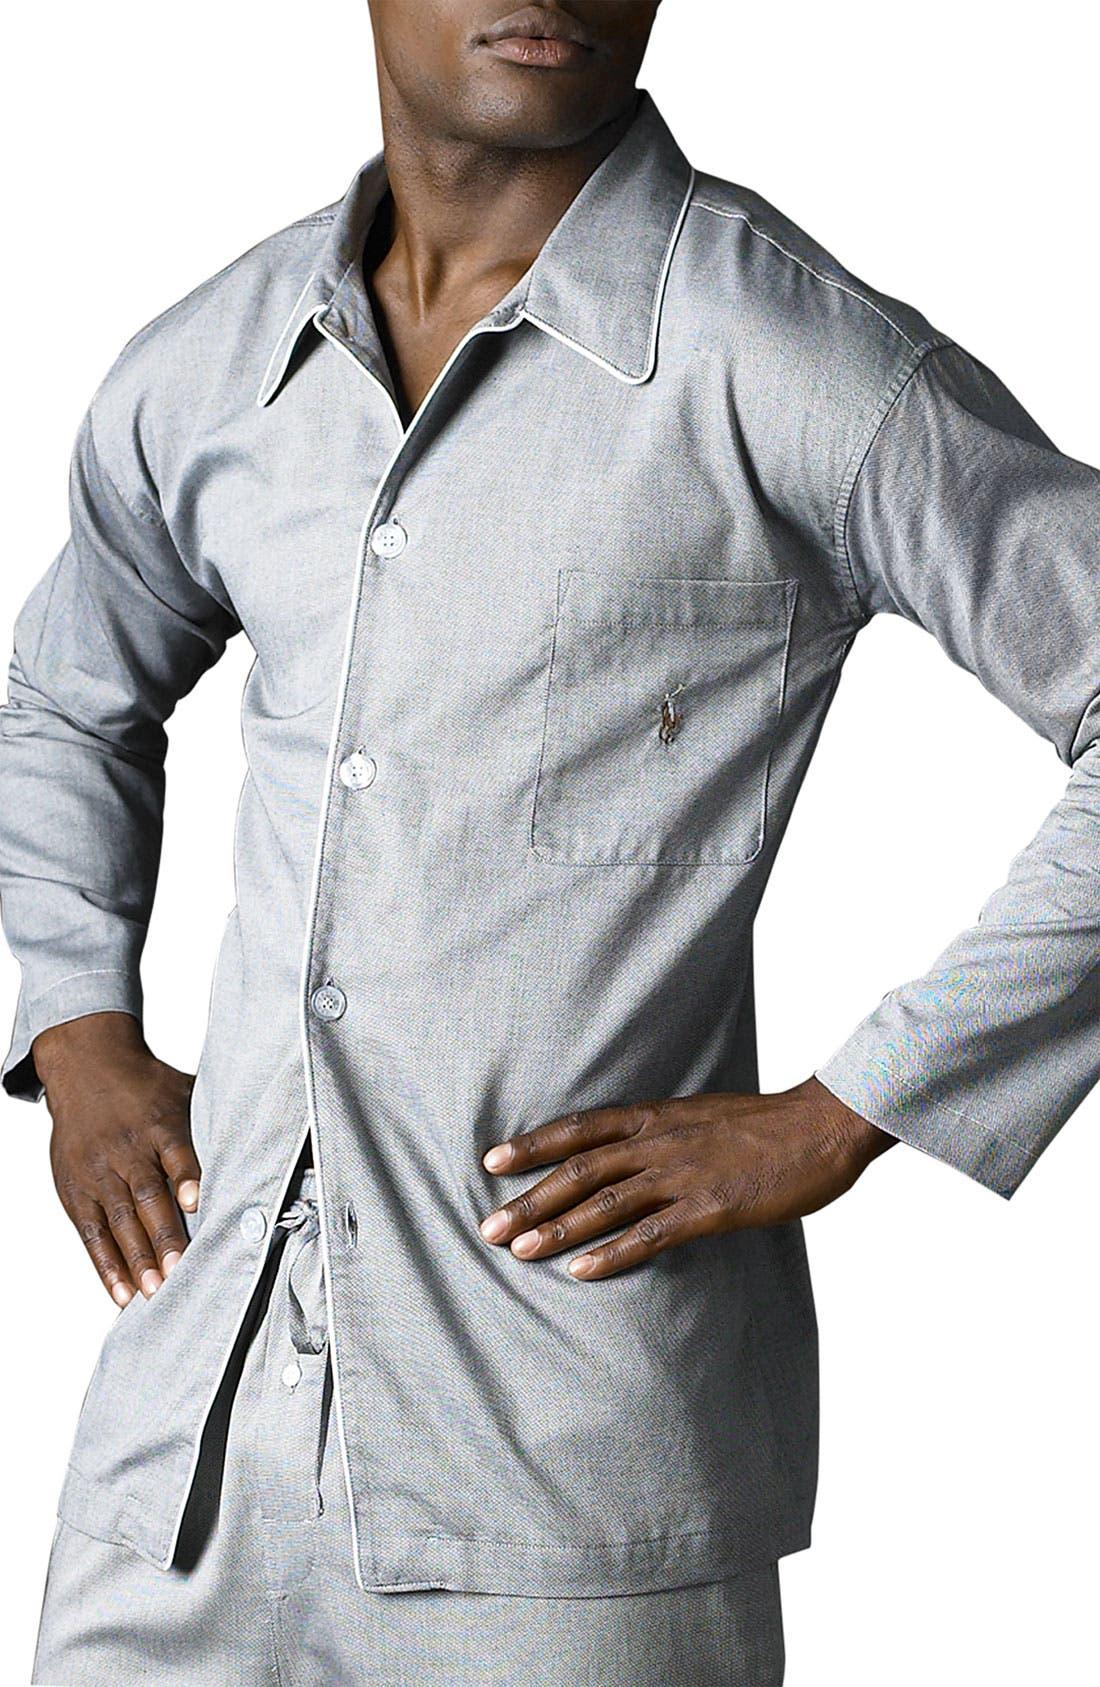 Alternate Image 1 Selected - Polo Ralph Lauren Pajama Top